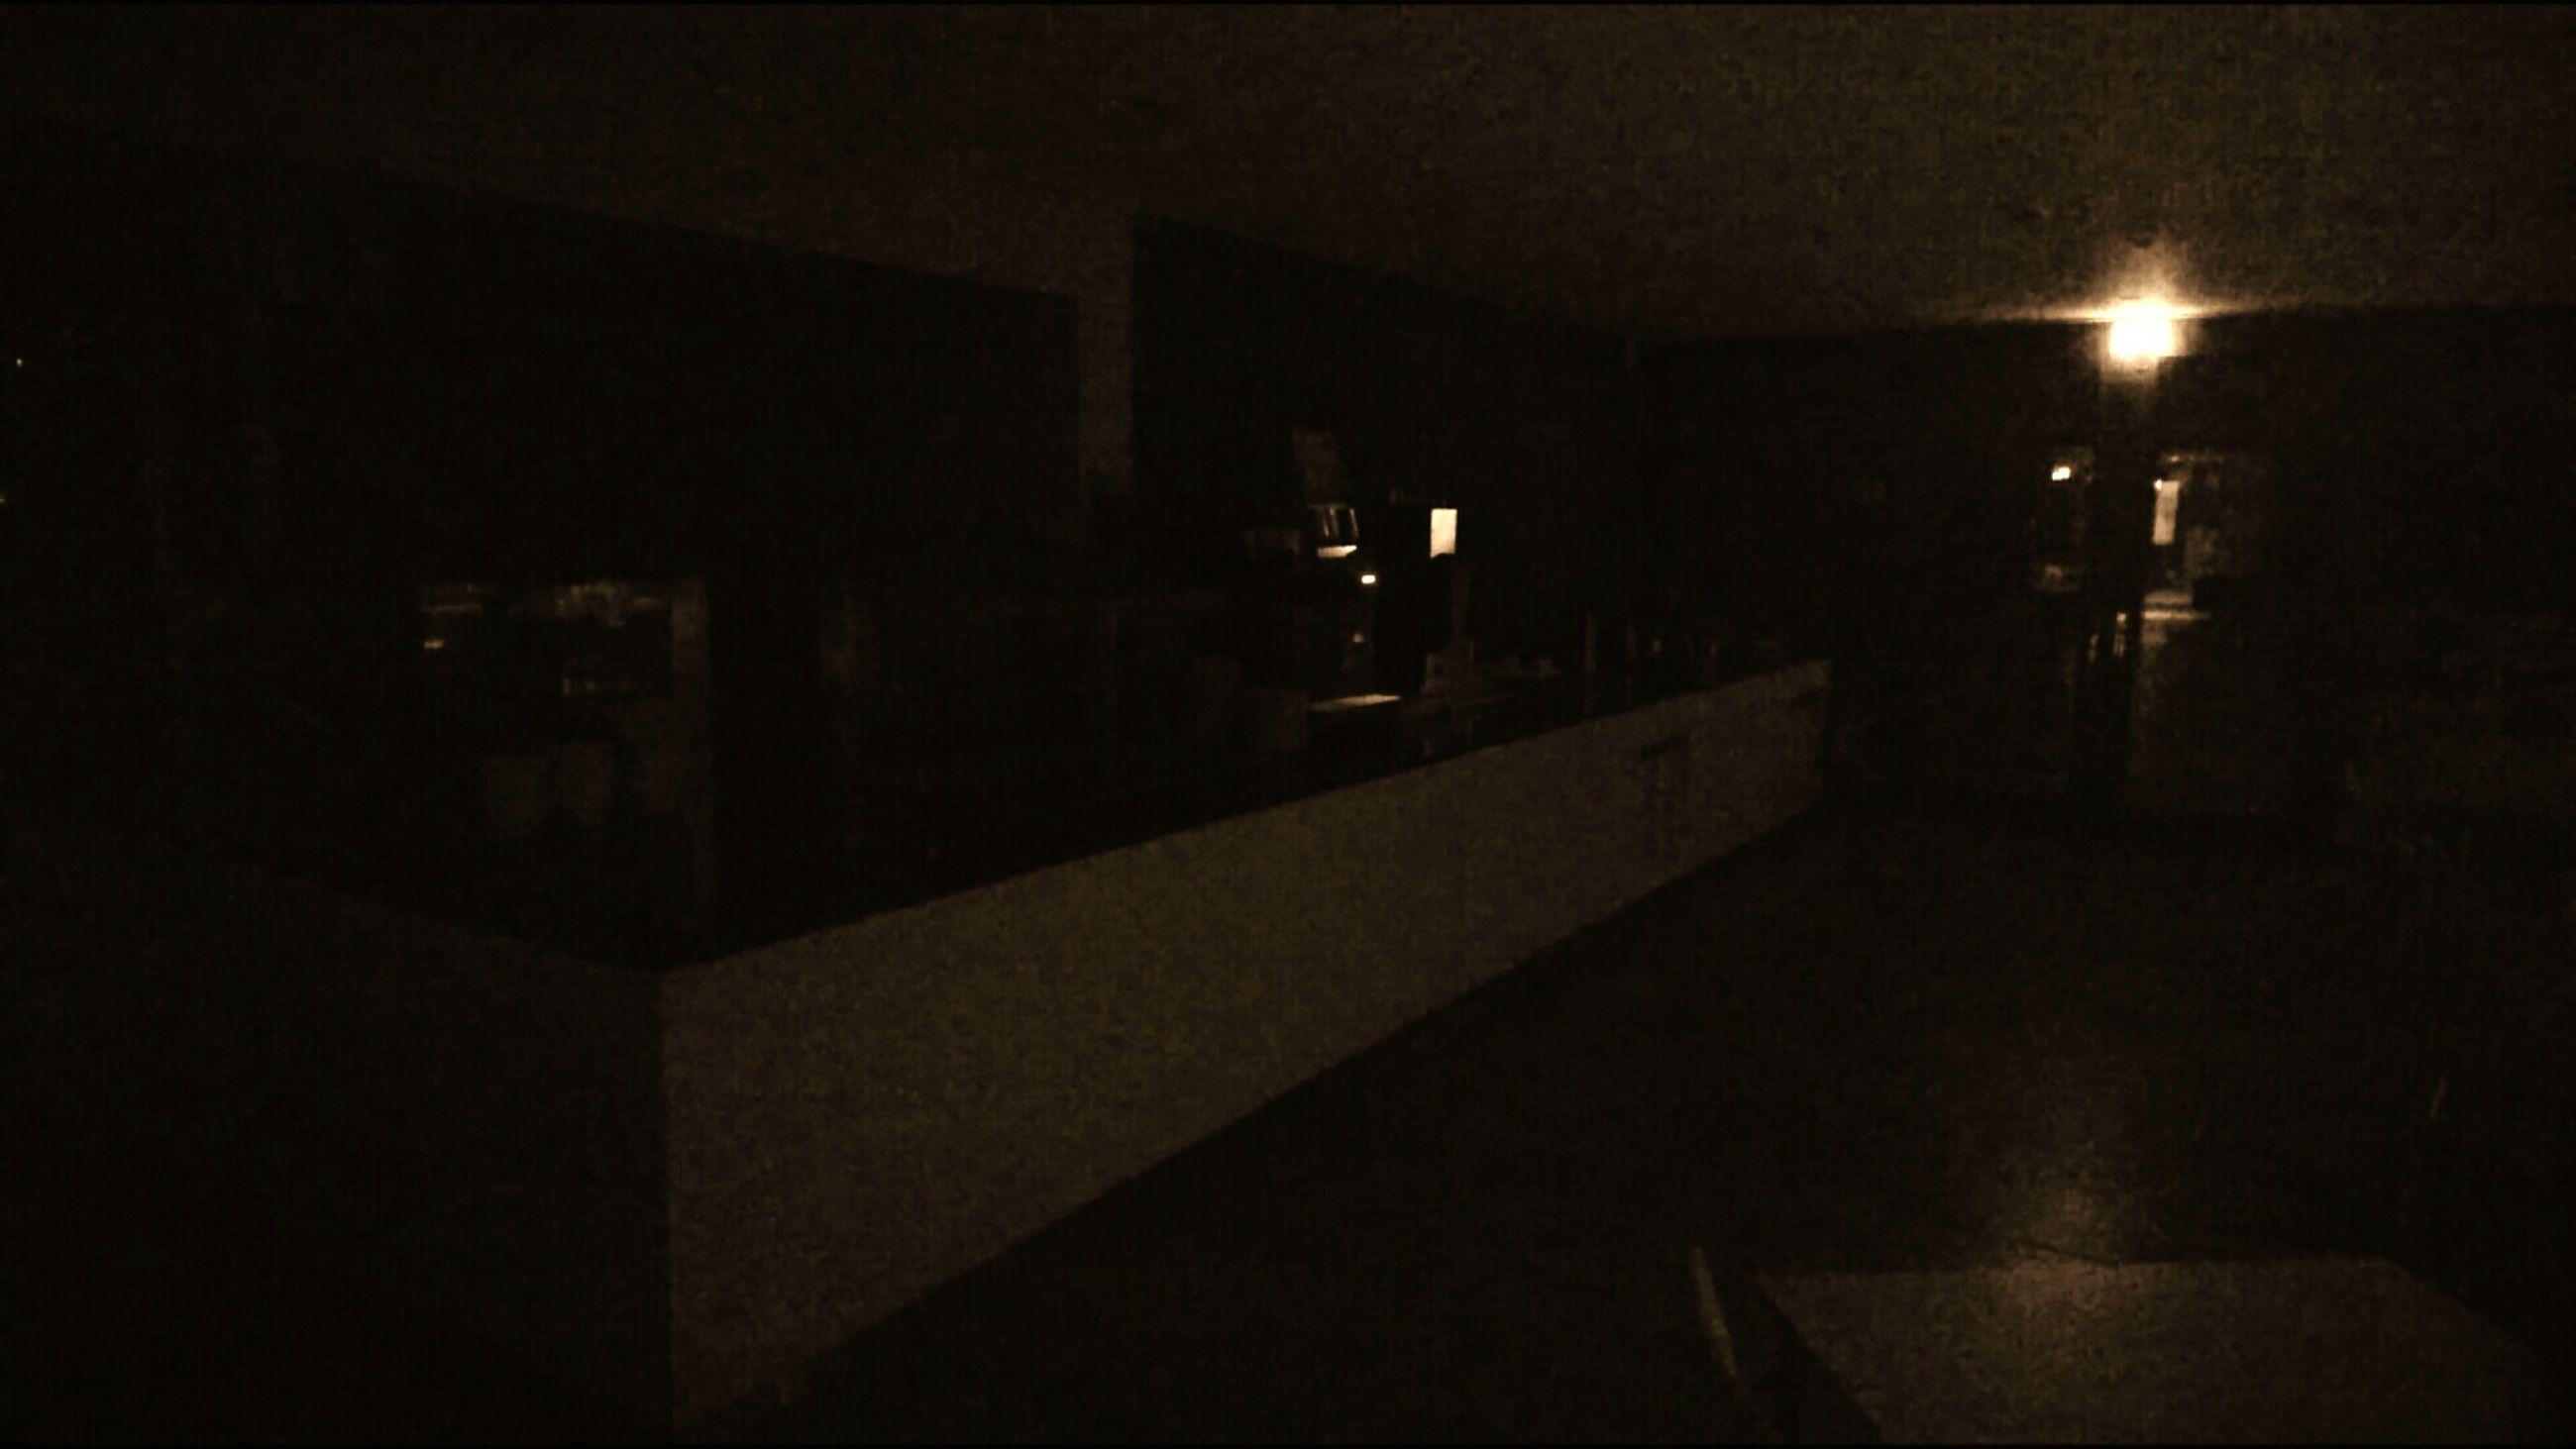 illuminated, night, architecture, lighting equipment, built structure, dark, electric light, empty, no people, lit, glowing, light